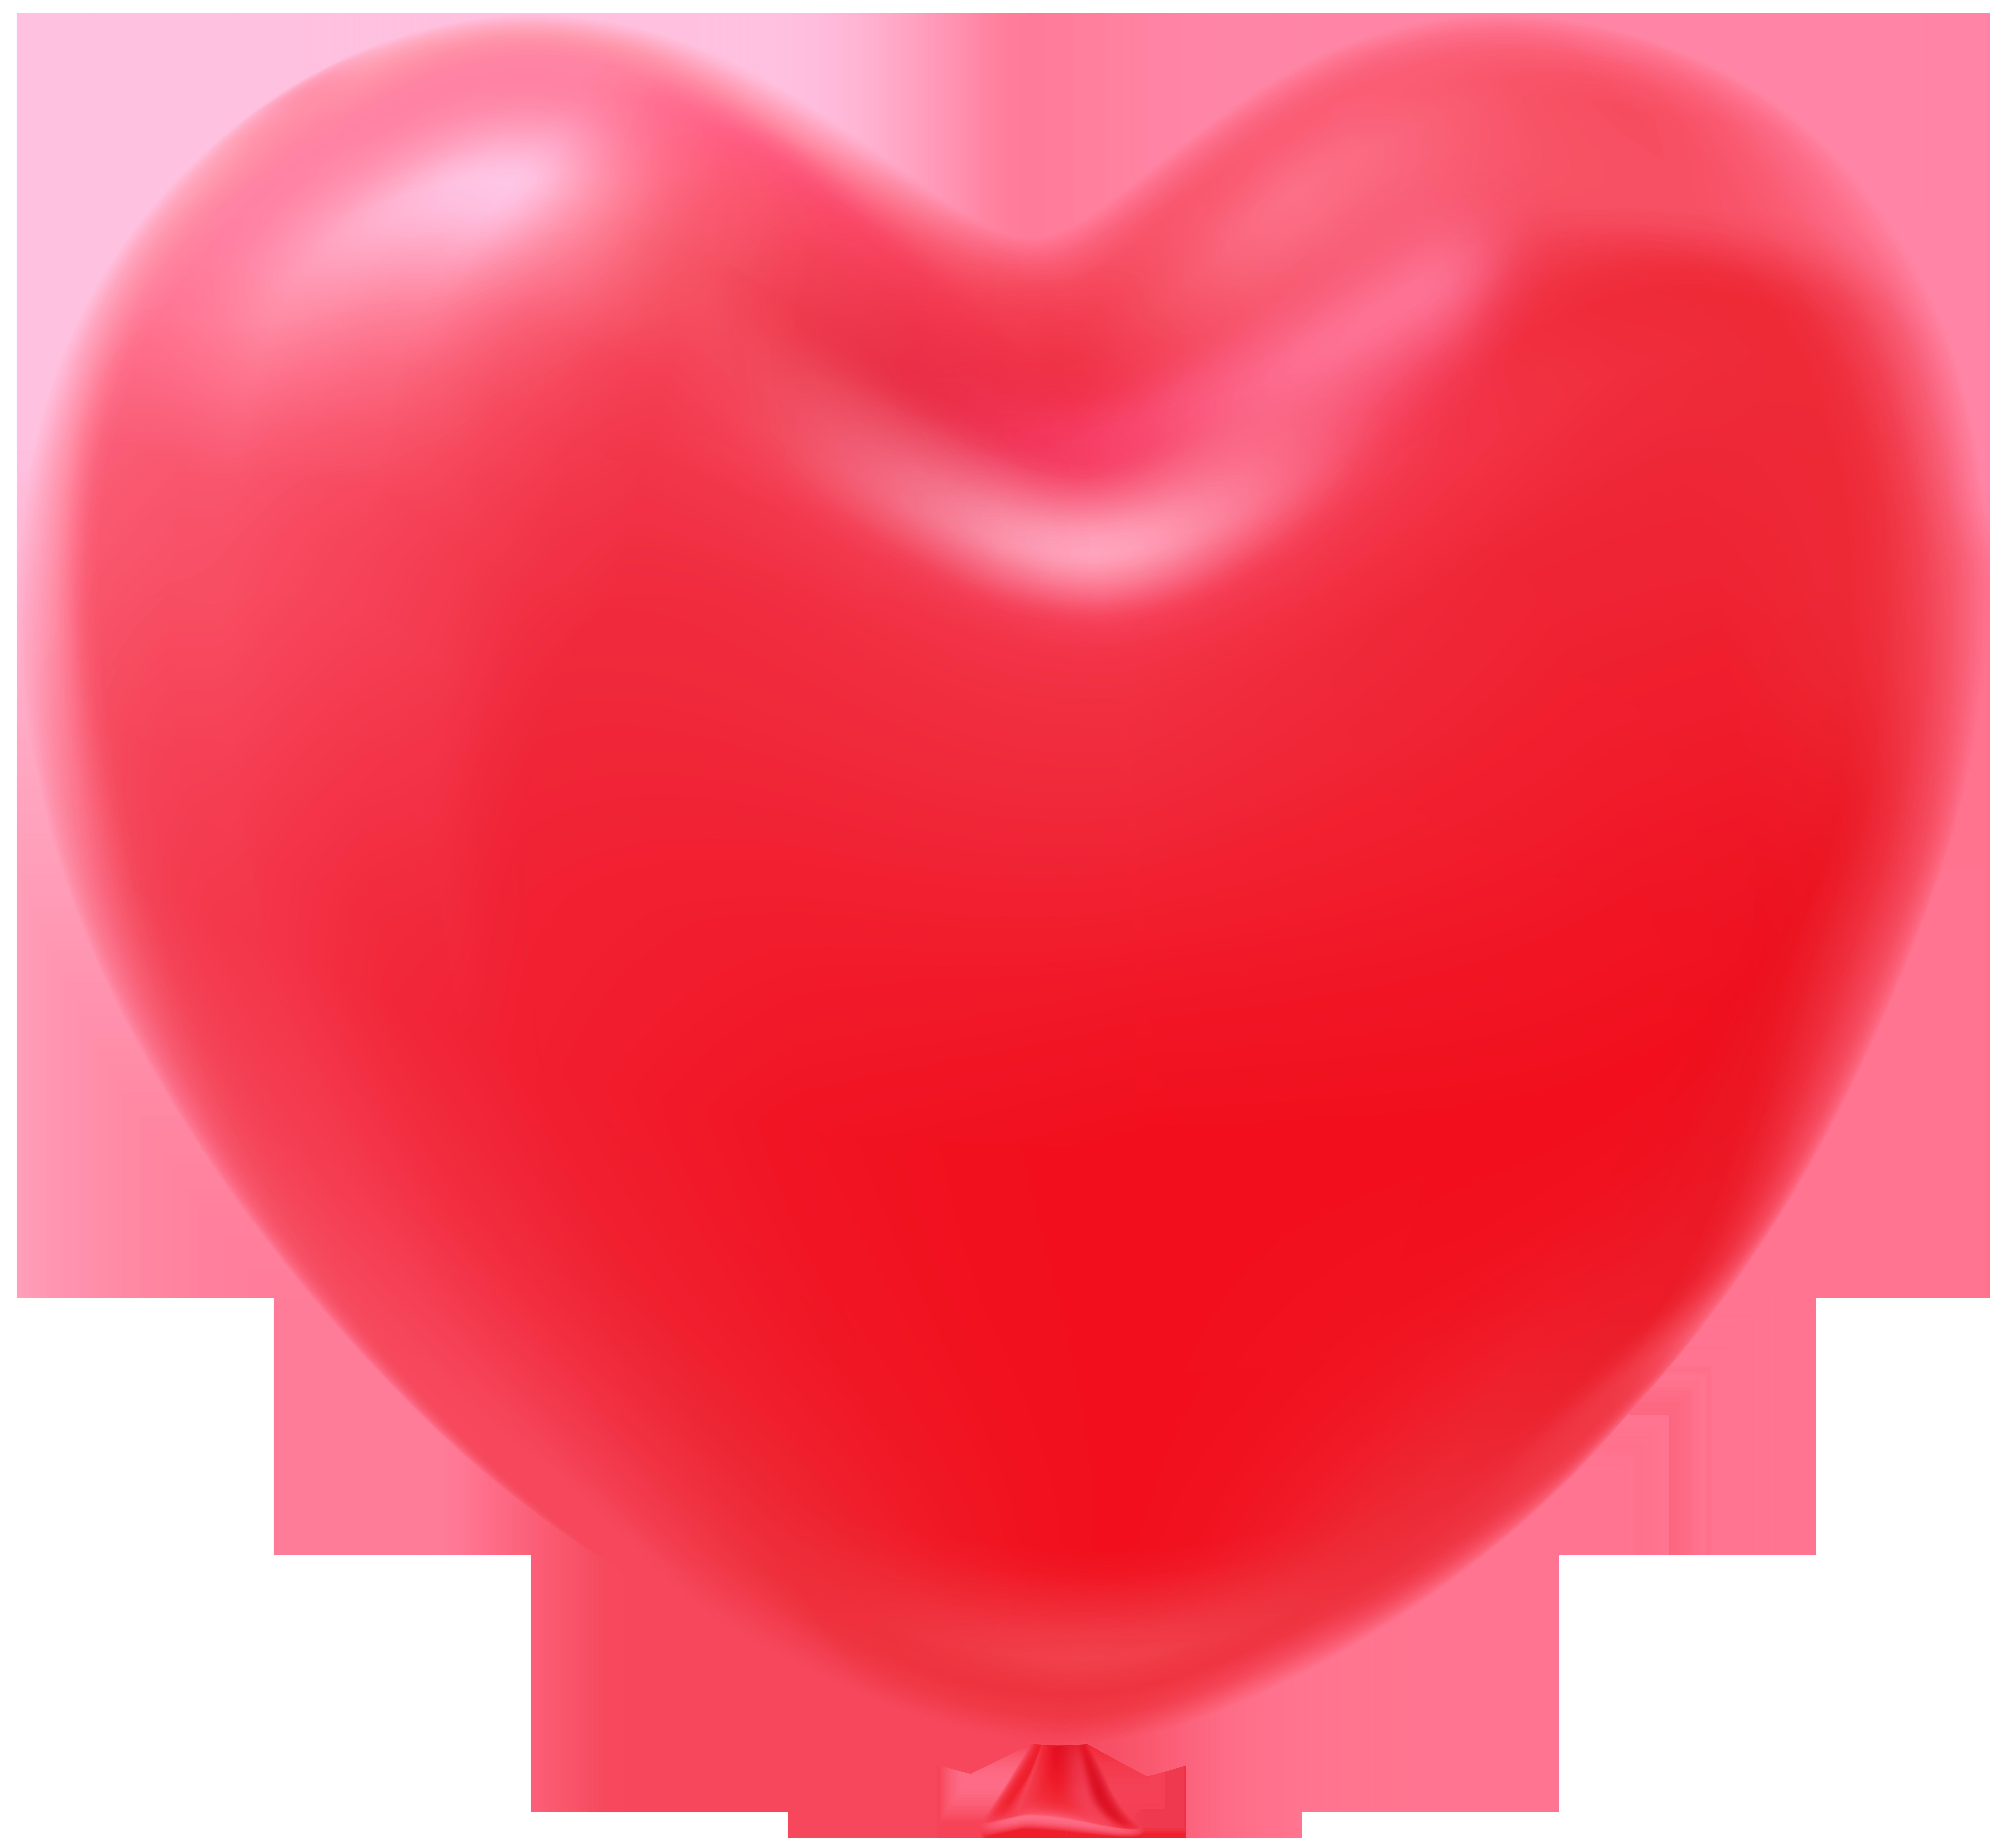 Clipart heart shape jpg royalty free stock Heart Shape Balloon Red Transparent Clip Art Image | Gallery ... jpg royalty free stock